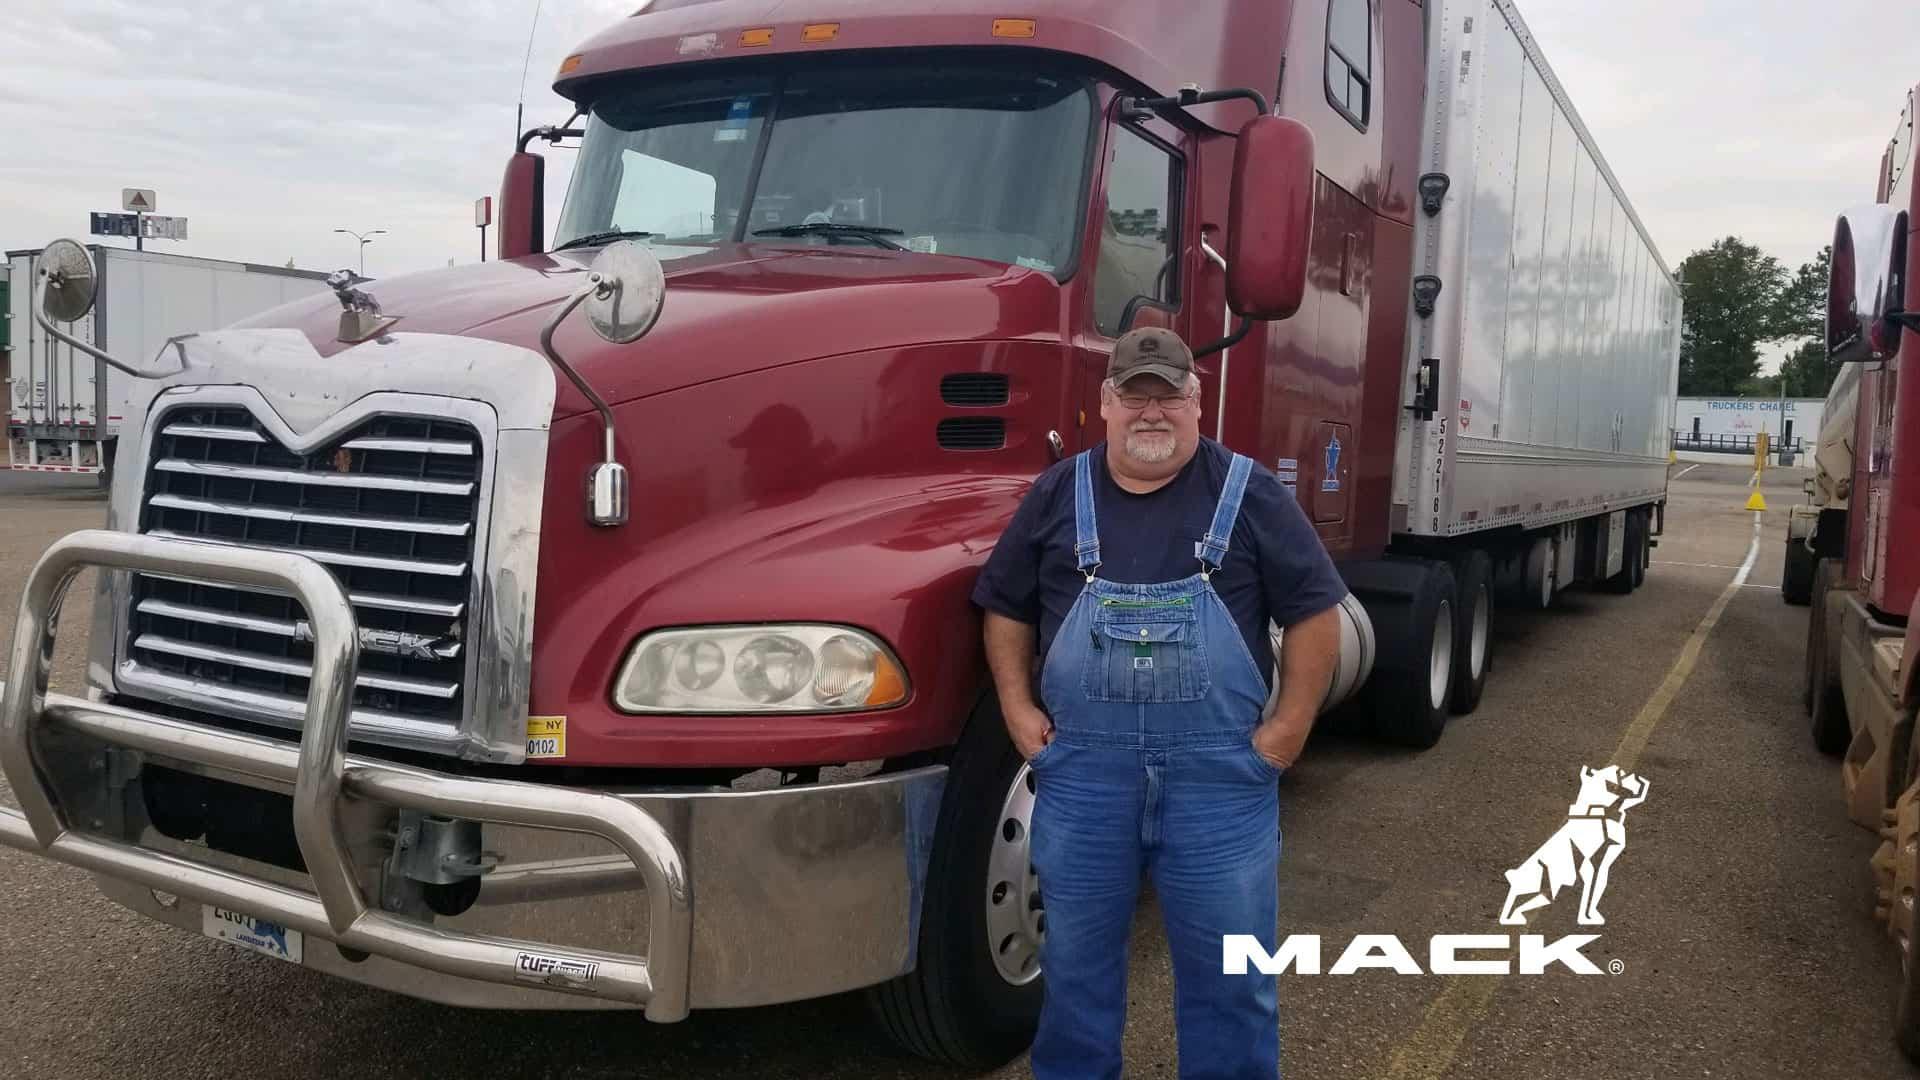 Mack Engine Overhaul Financing Testimonial from Customer 1